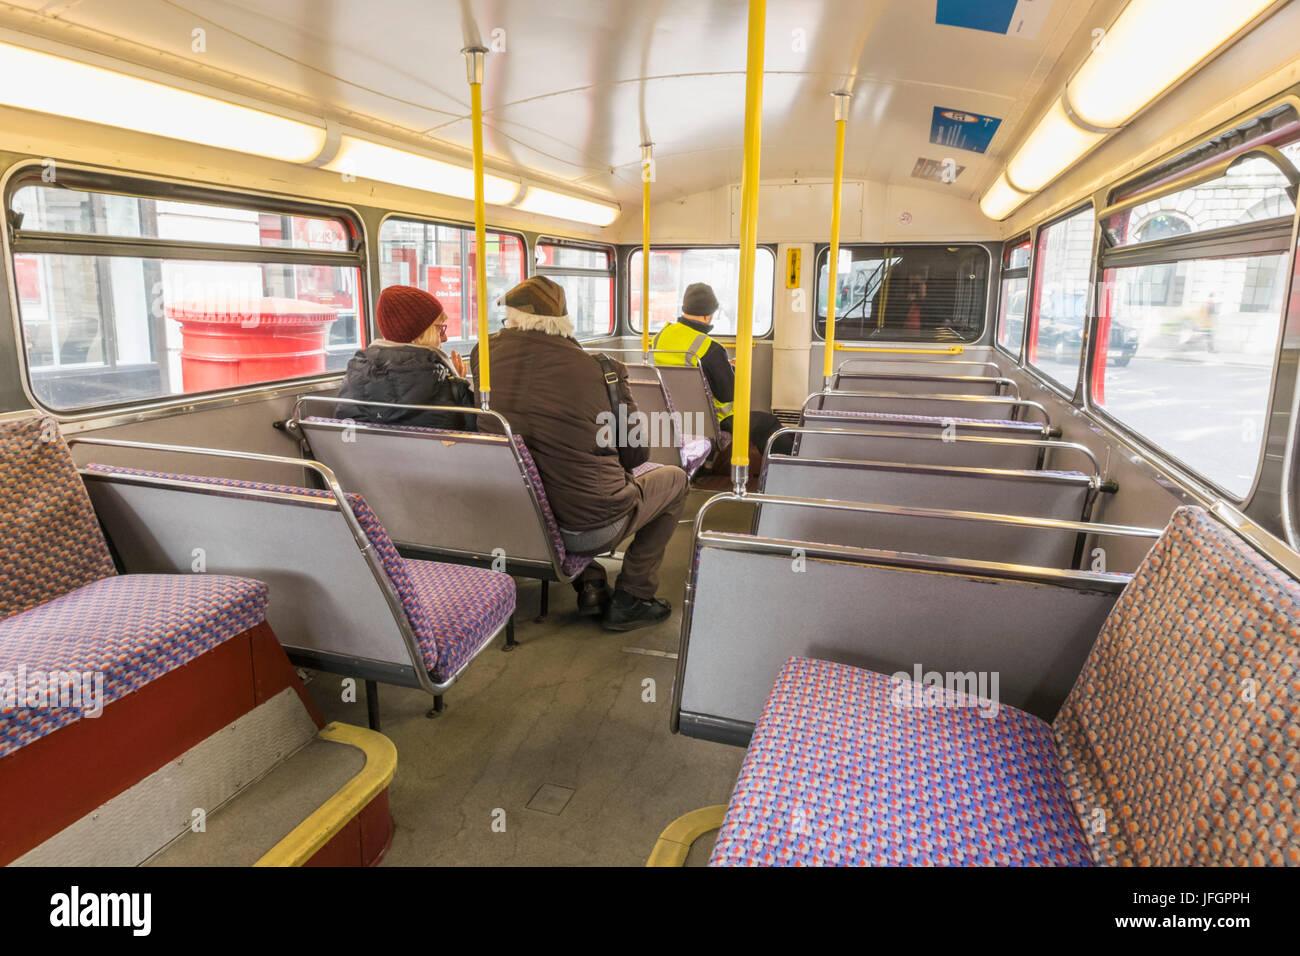 England, London, Interior of Routemaster Double Decker Bus Stock ...